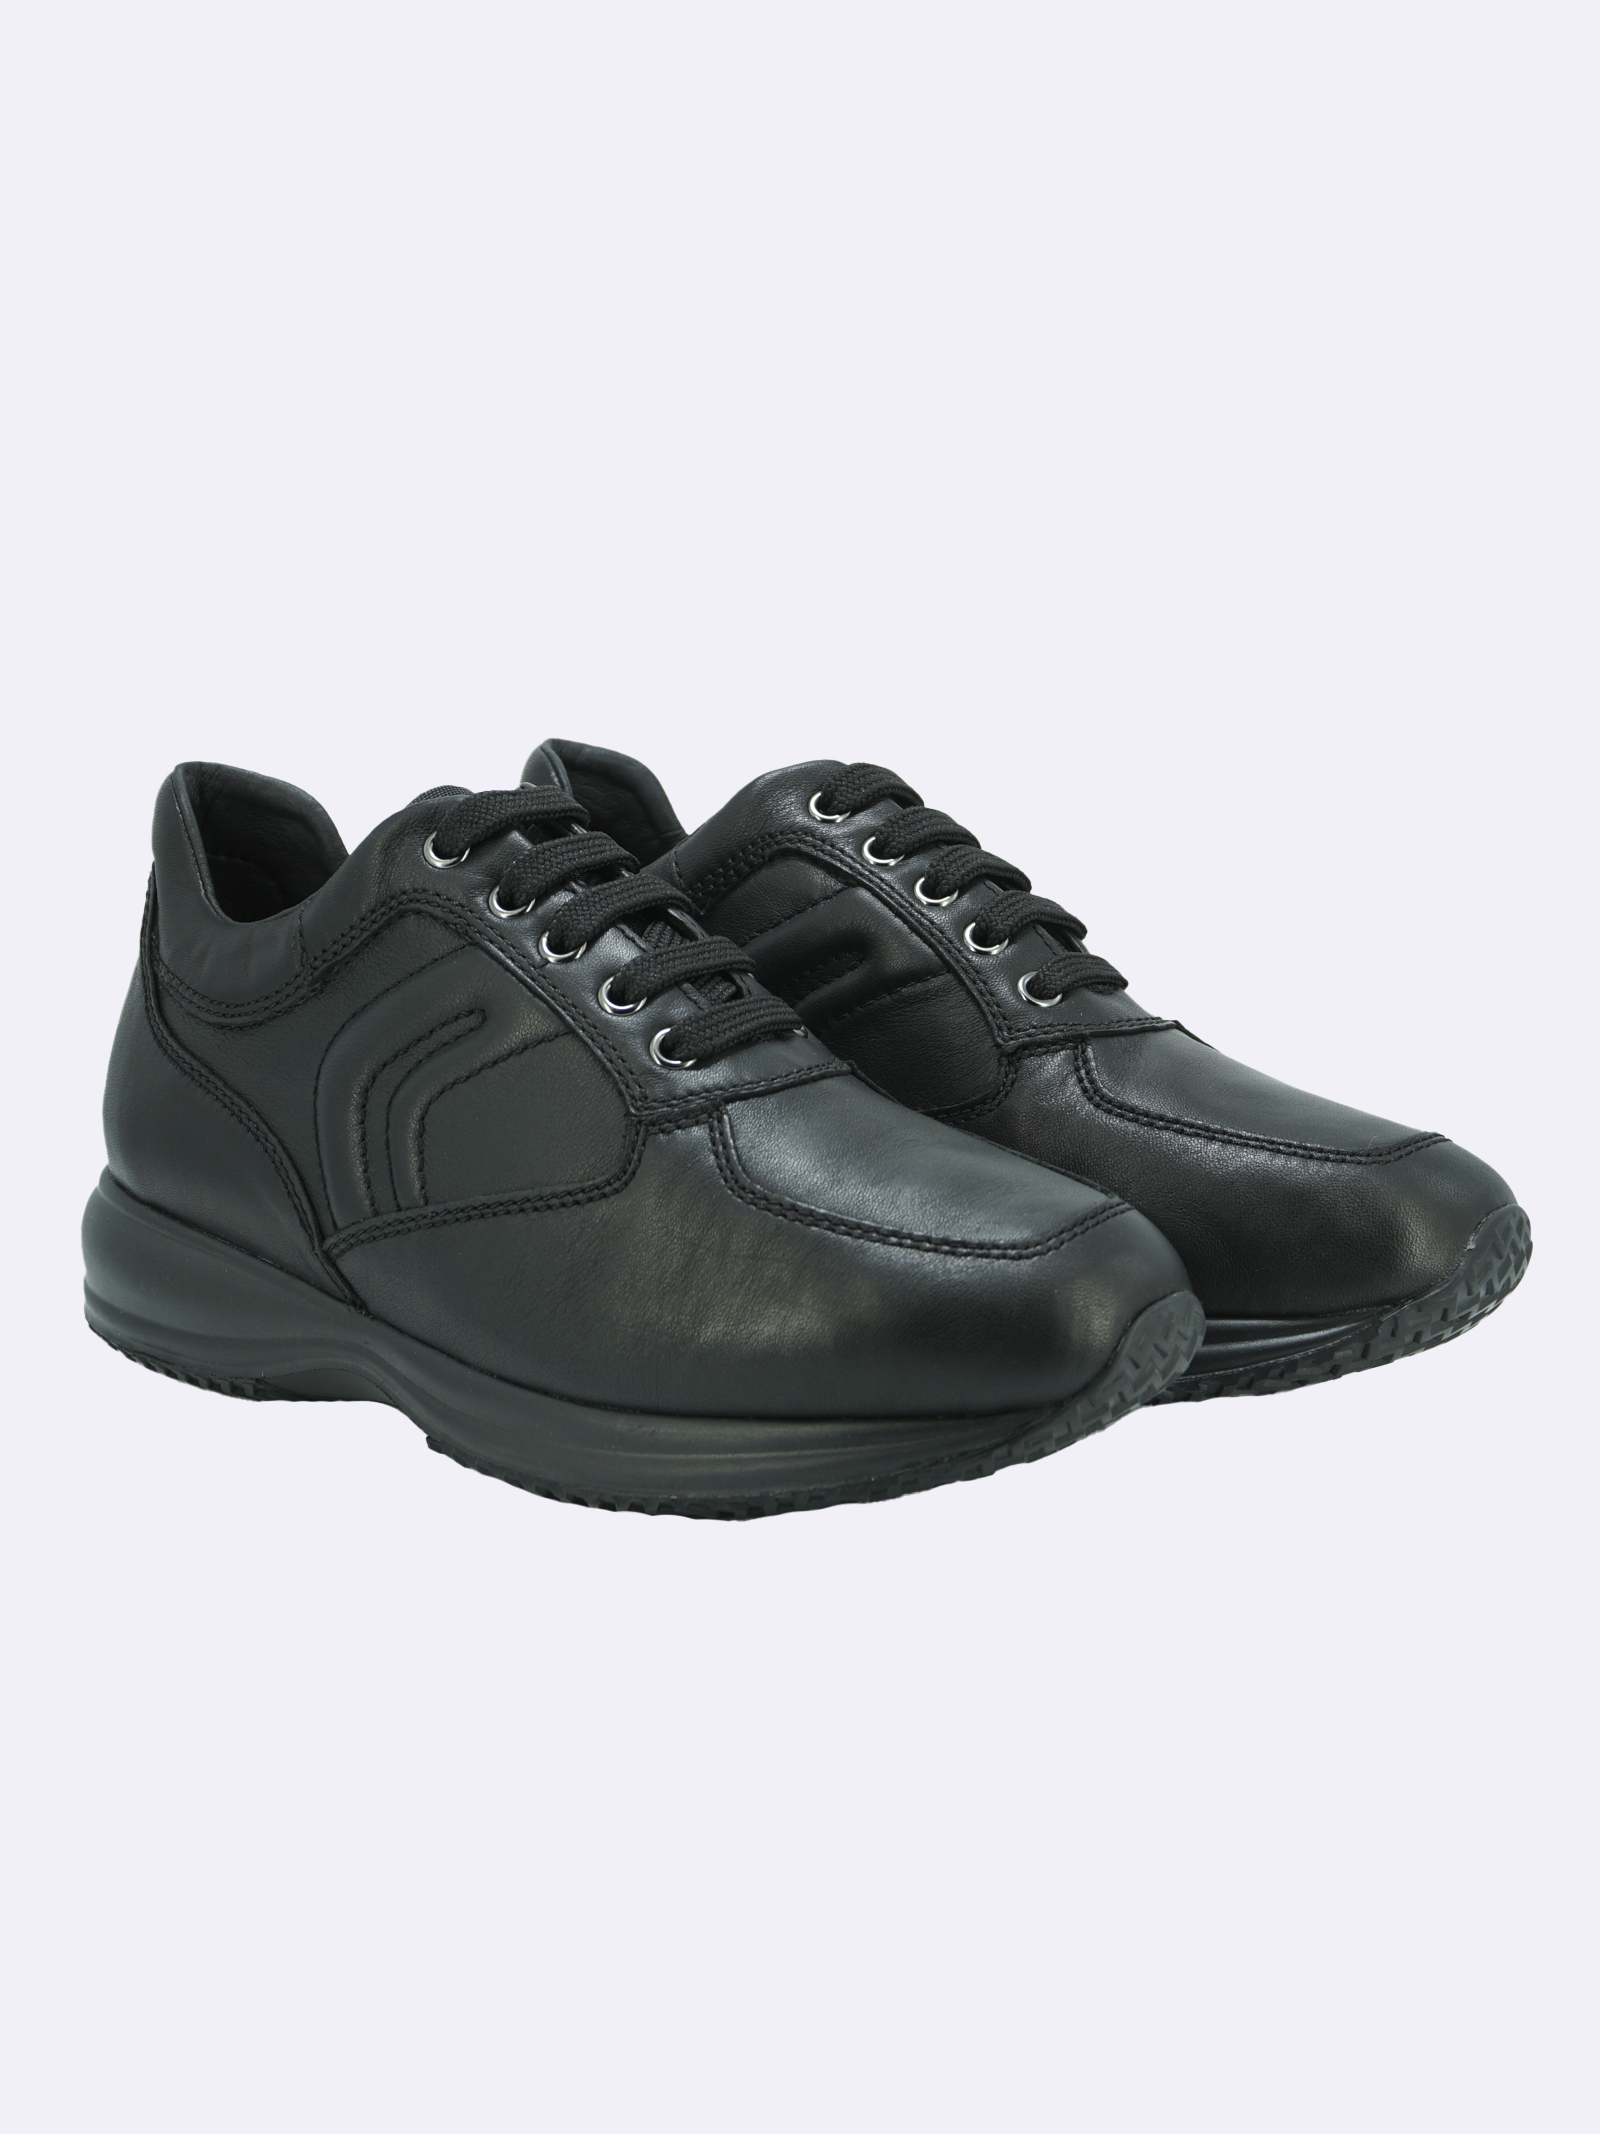 Sneakers Uomo in Pelle Nera Plantare Estraibile GEOX | Sneakers | HAPPYU4356HNEROC9999